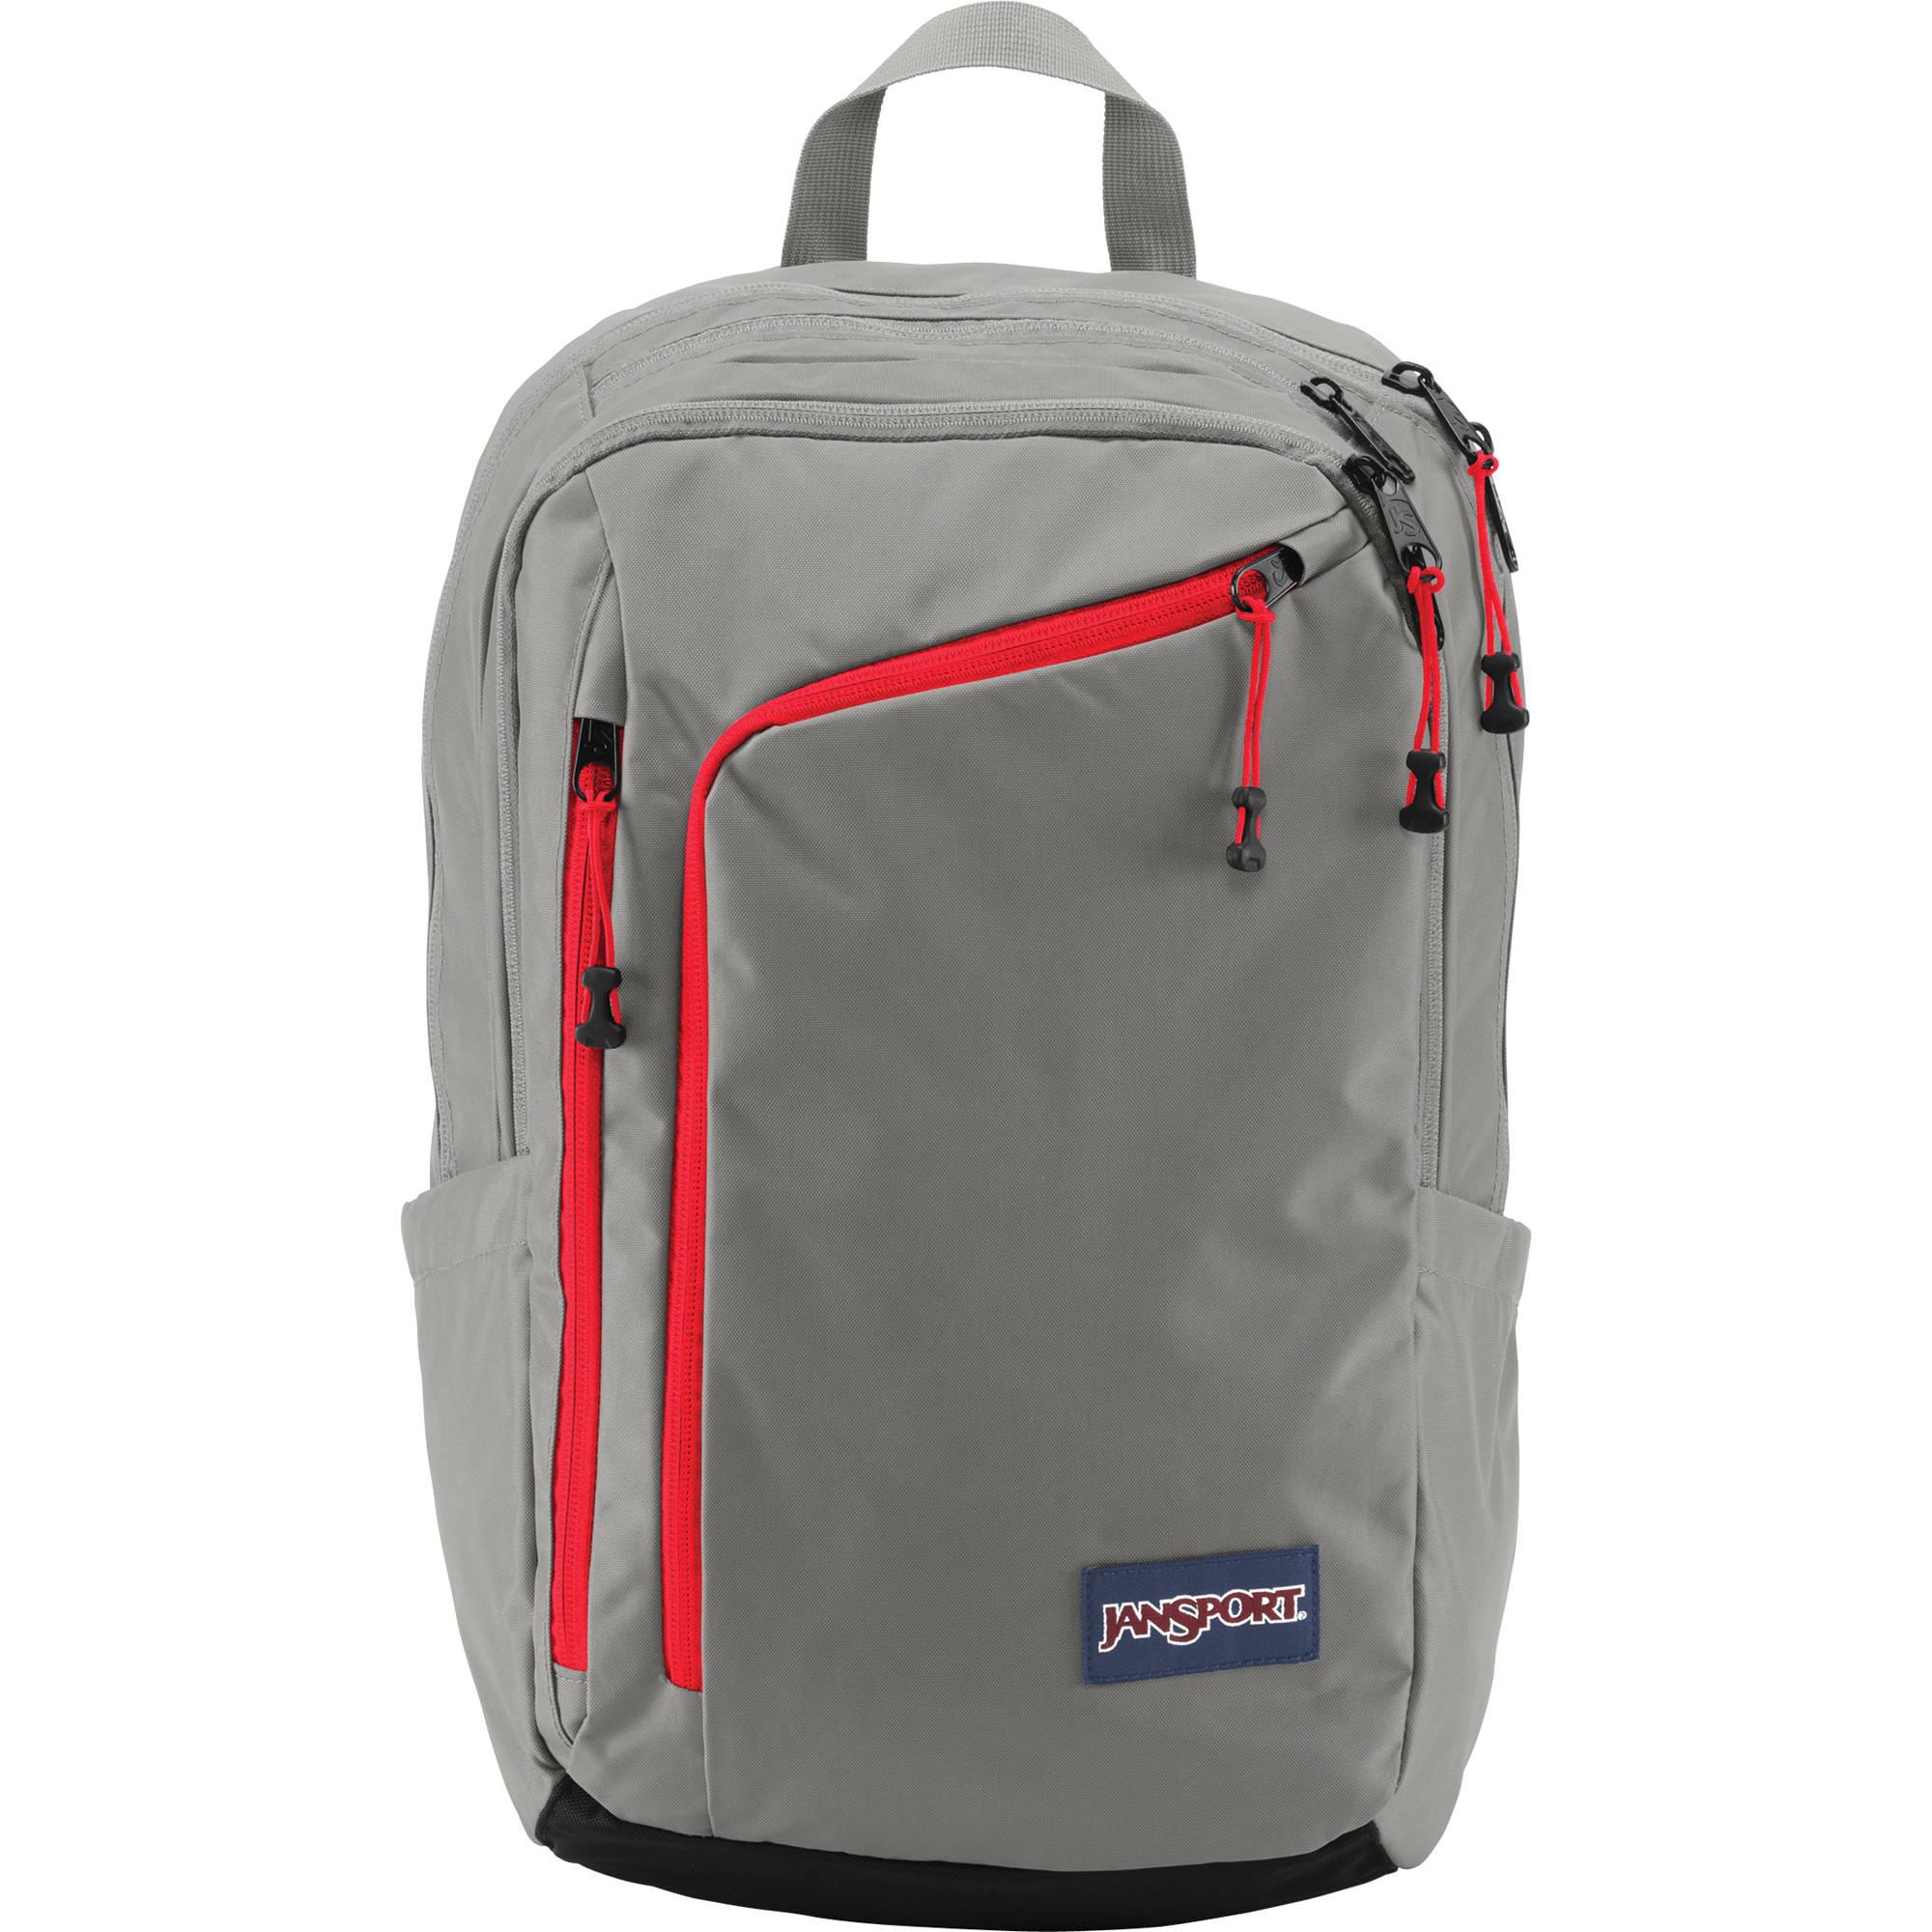 JanSport Platform 25L Backpack (Shady Gray) T55B9RS B&H Photo